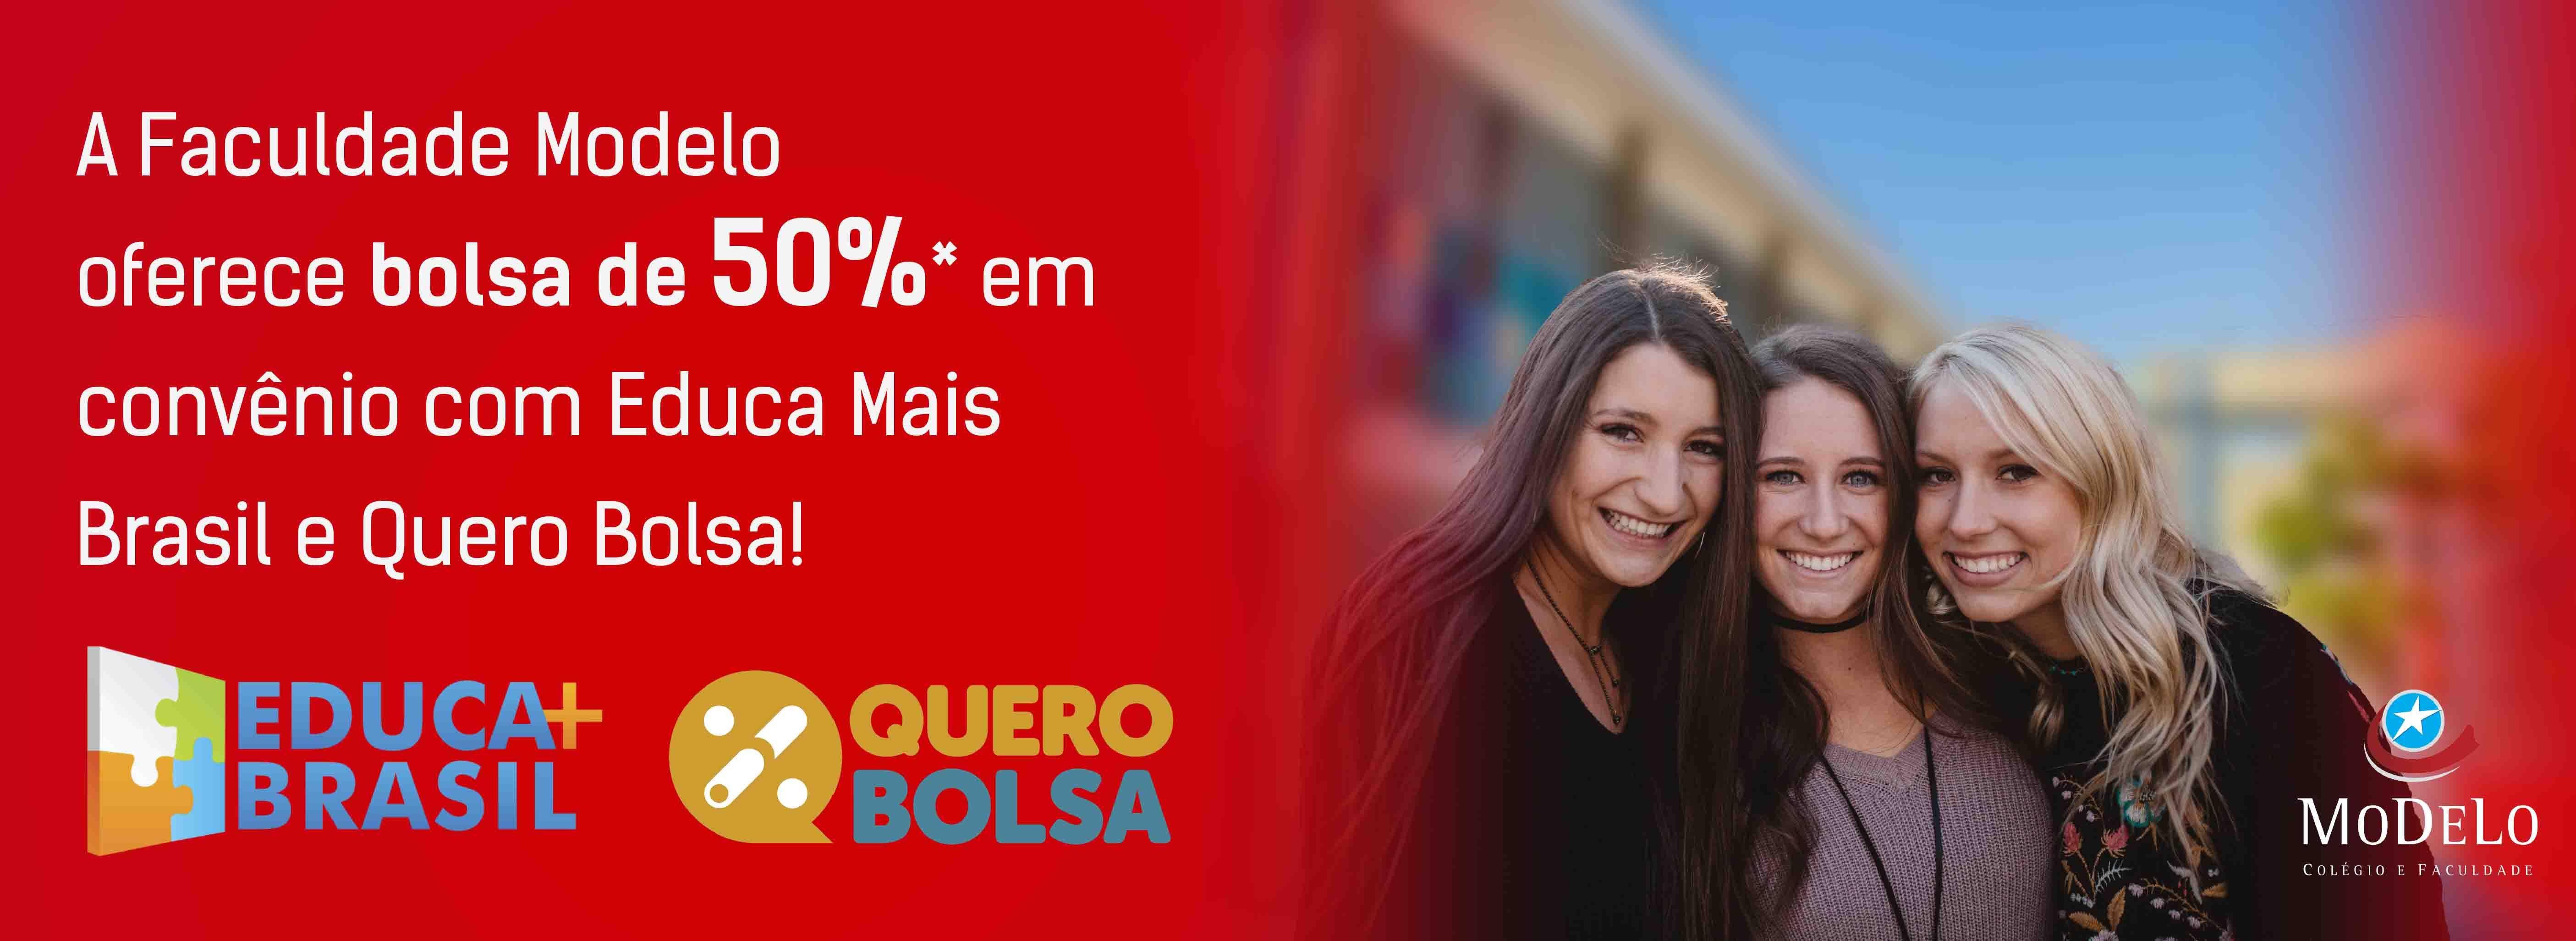 BANNER-EDUCA-MAIS-E-QRO-BOLSA2